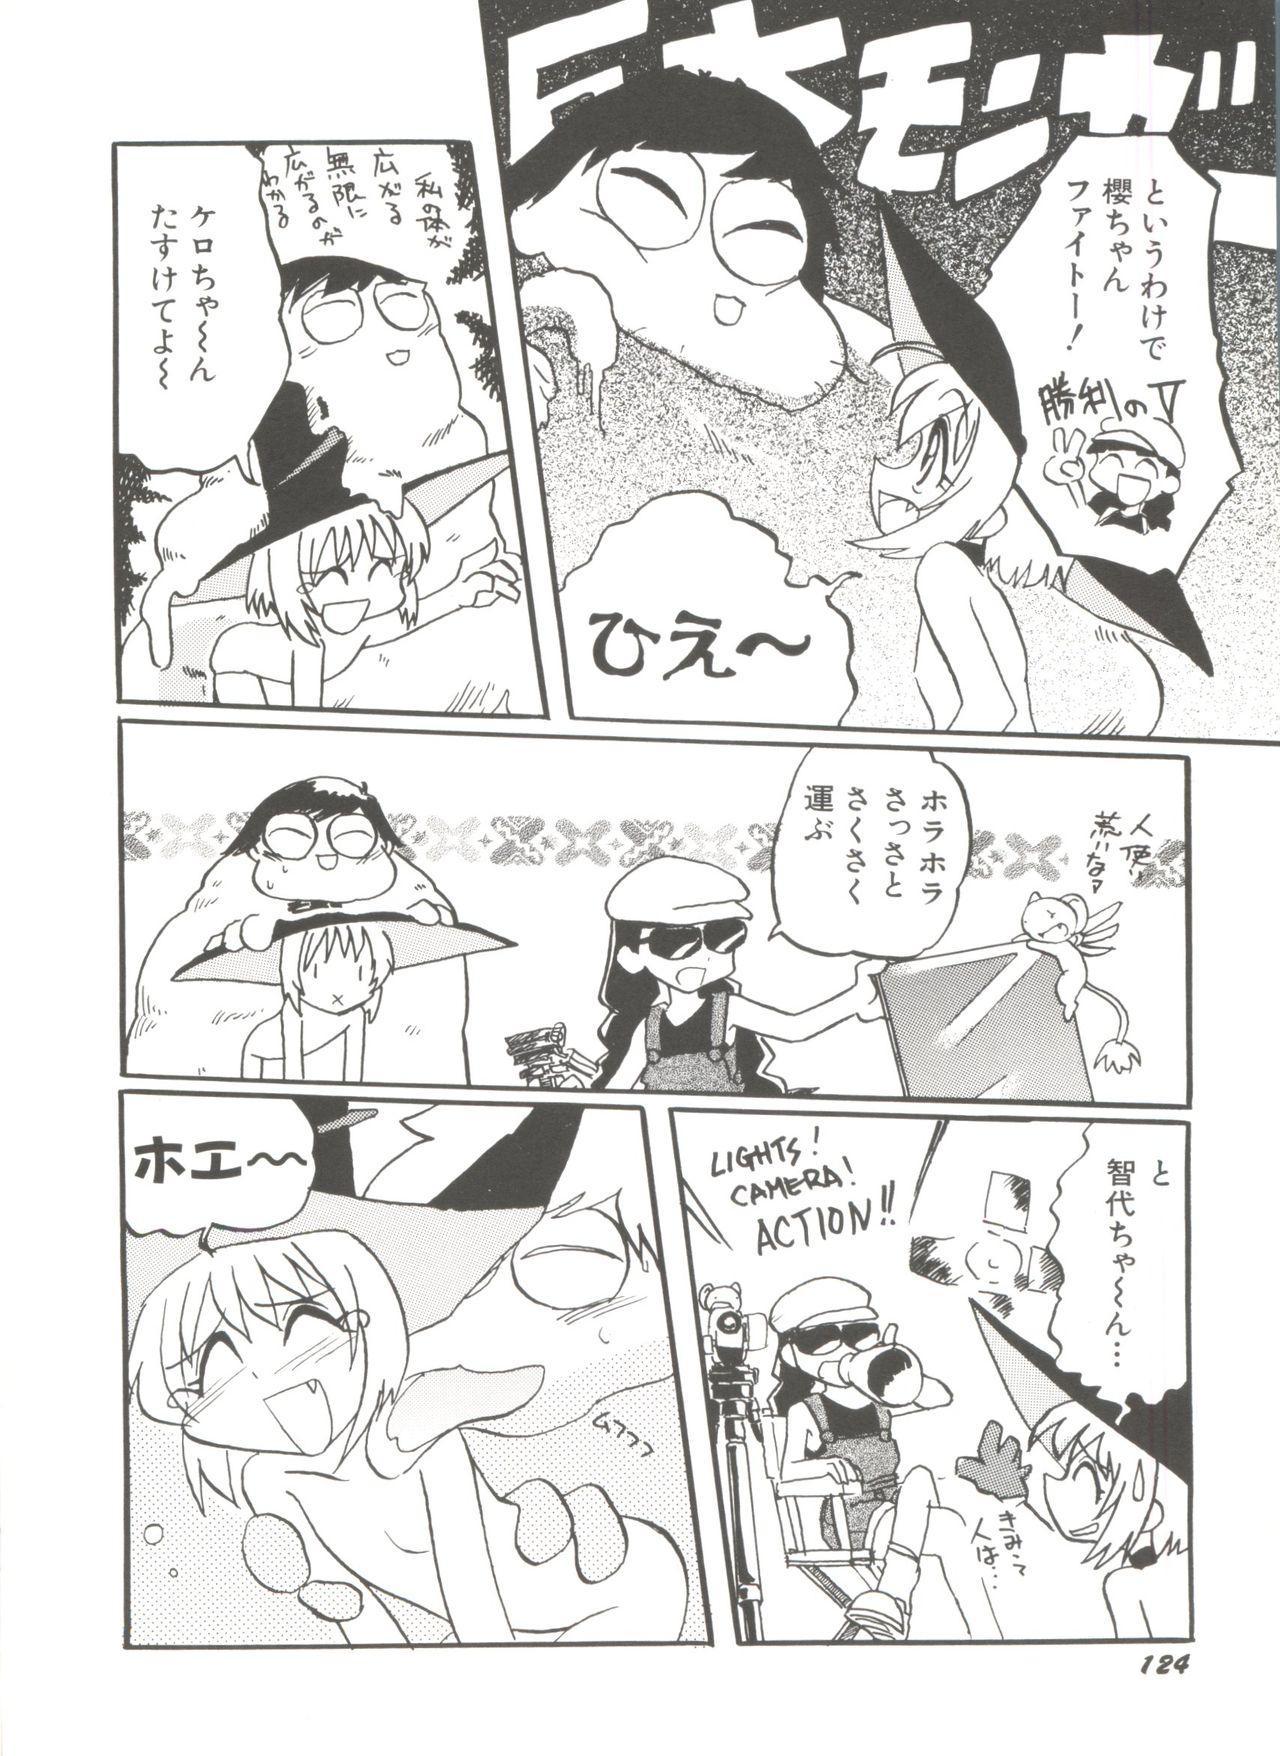 [Anthology] Denei Tamatebako 8 - Utakata no Tenshi-tachi II (Various) 125